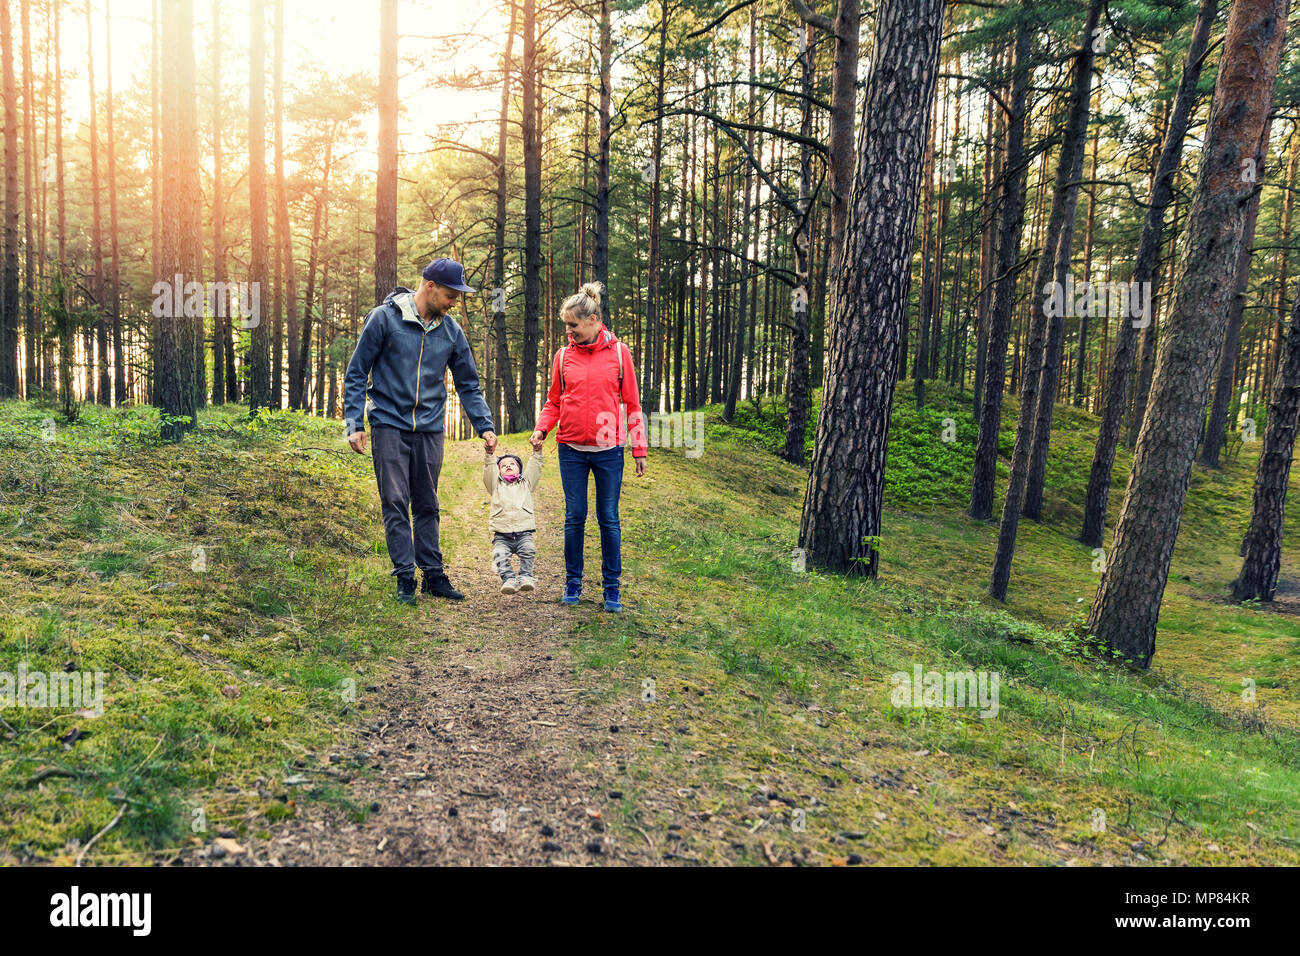 Familie Spaziergang im Wald Stockbild